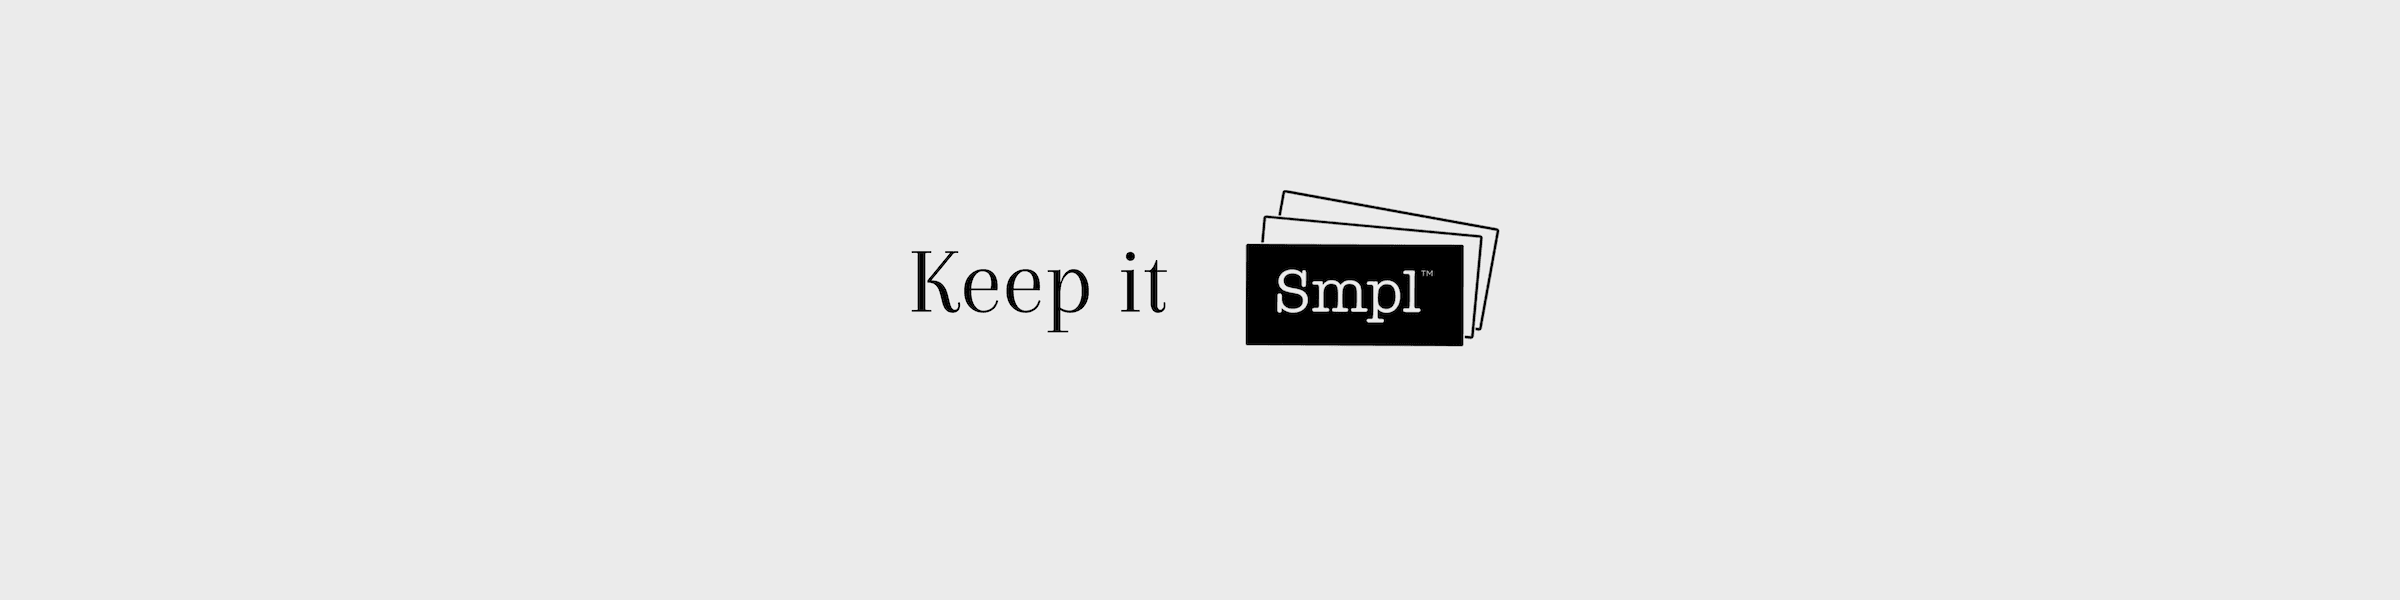 Keep it Smpl